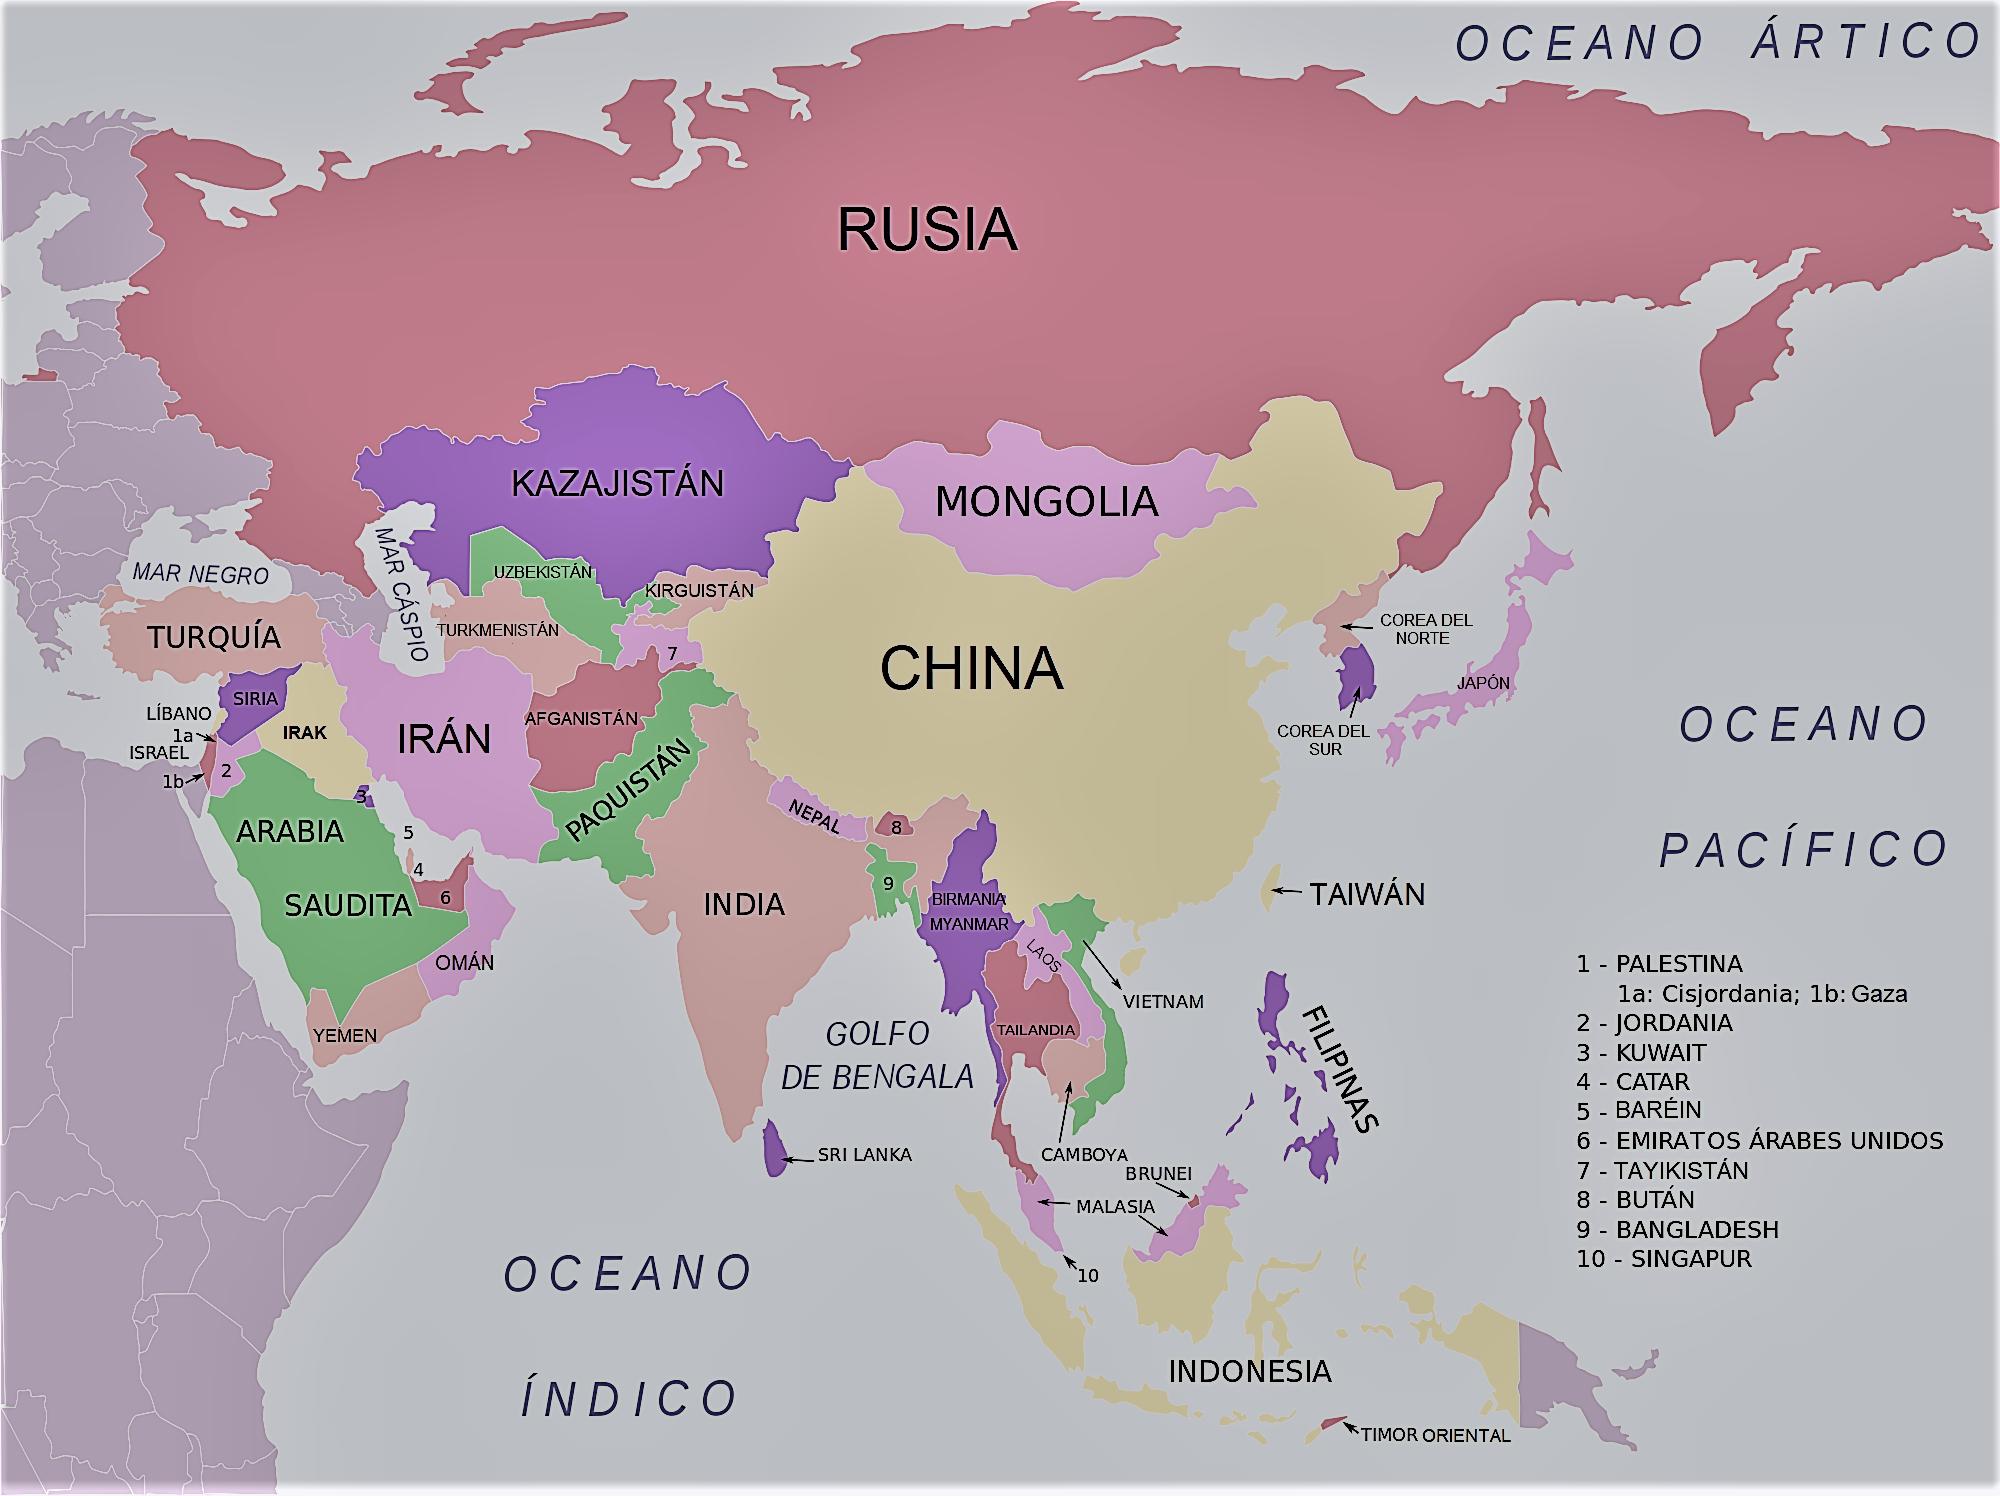 Mapa Politico De Asia Para Imprimir.Mapa De Asia Para Imprimir Mapamundi Politico Fisico